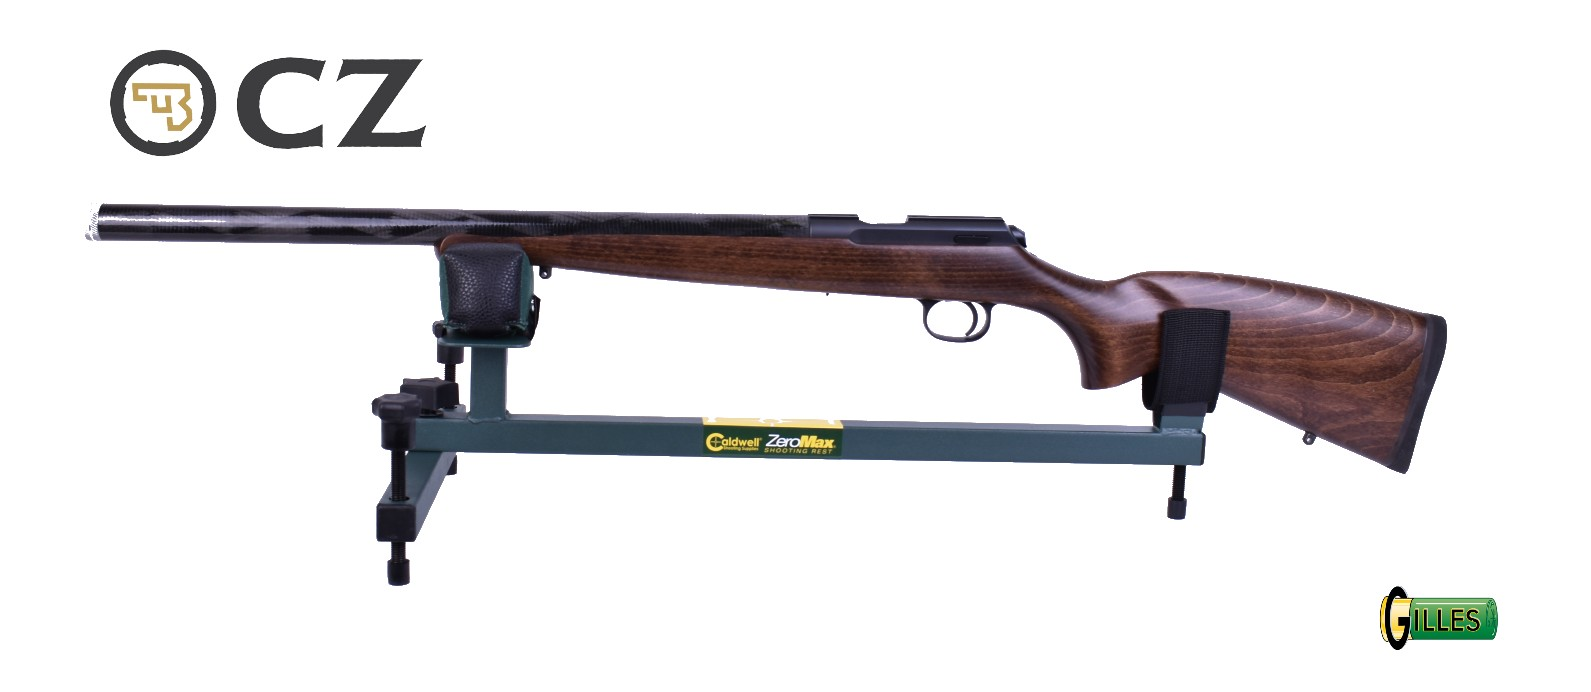 Carabine CZ 457 CUSTOM SILENCE ADAMANTIUM Cal. 22lr